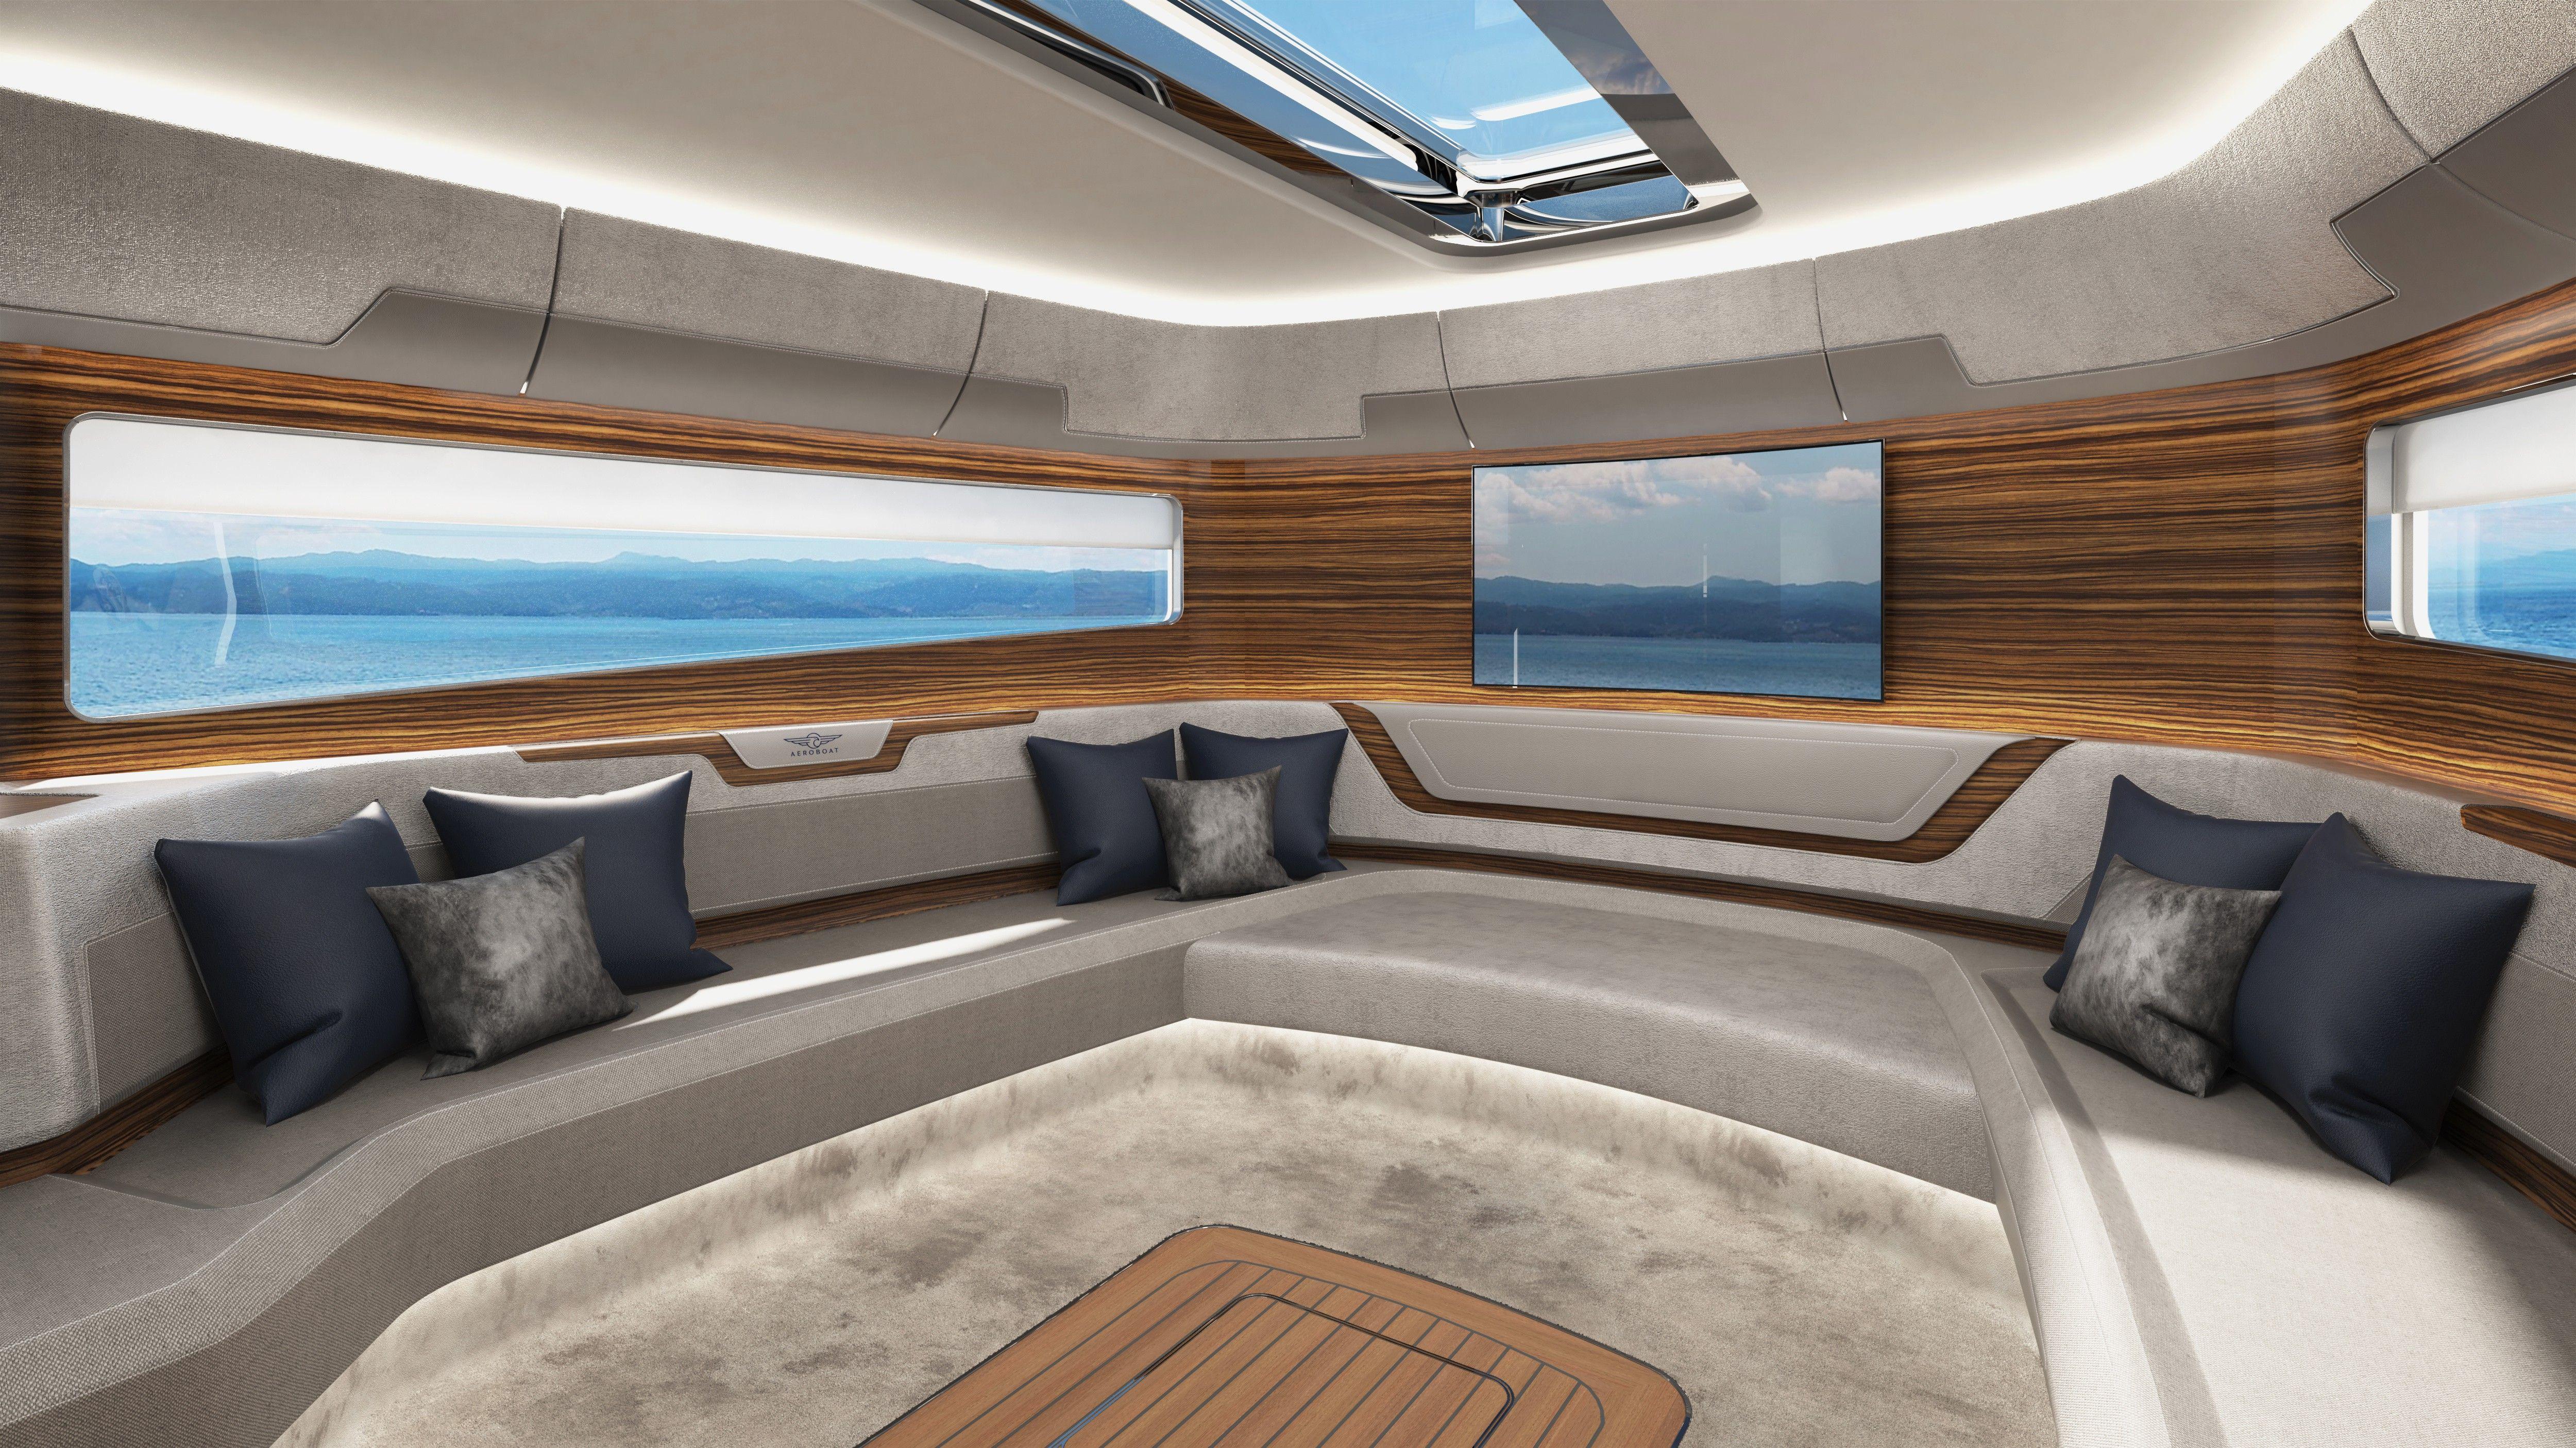 yacht interior design school psoriasisguru